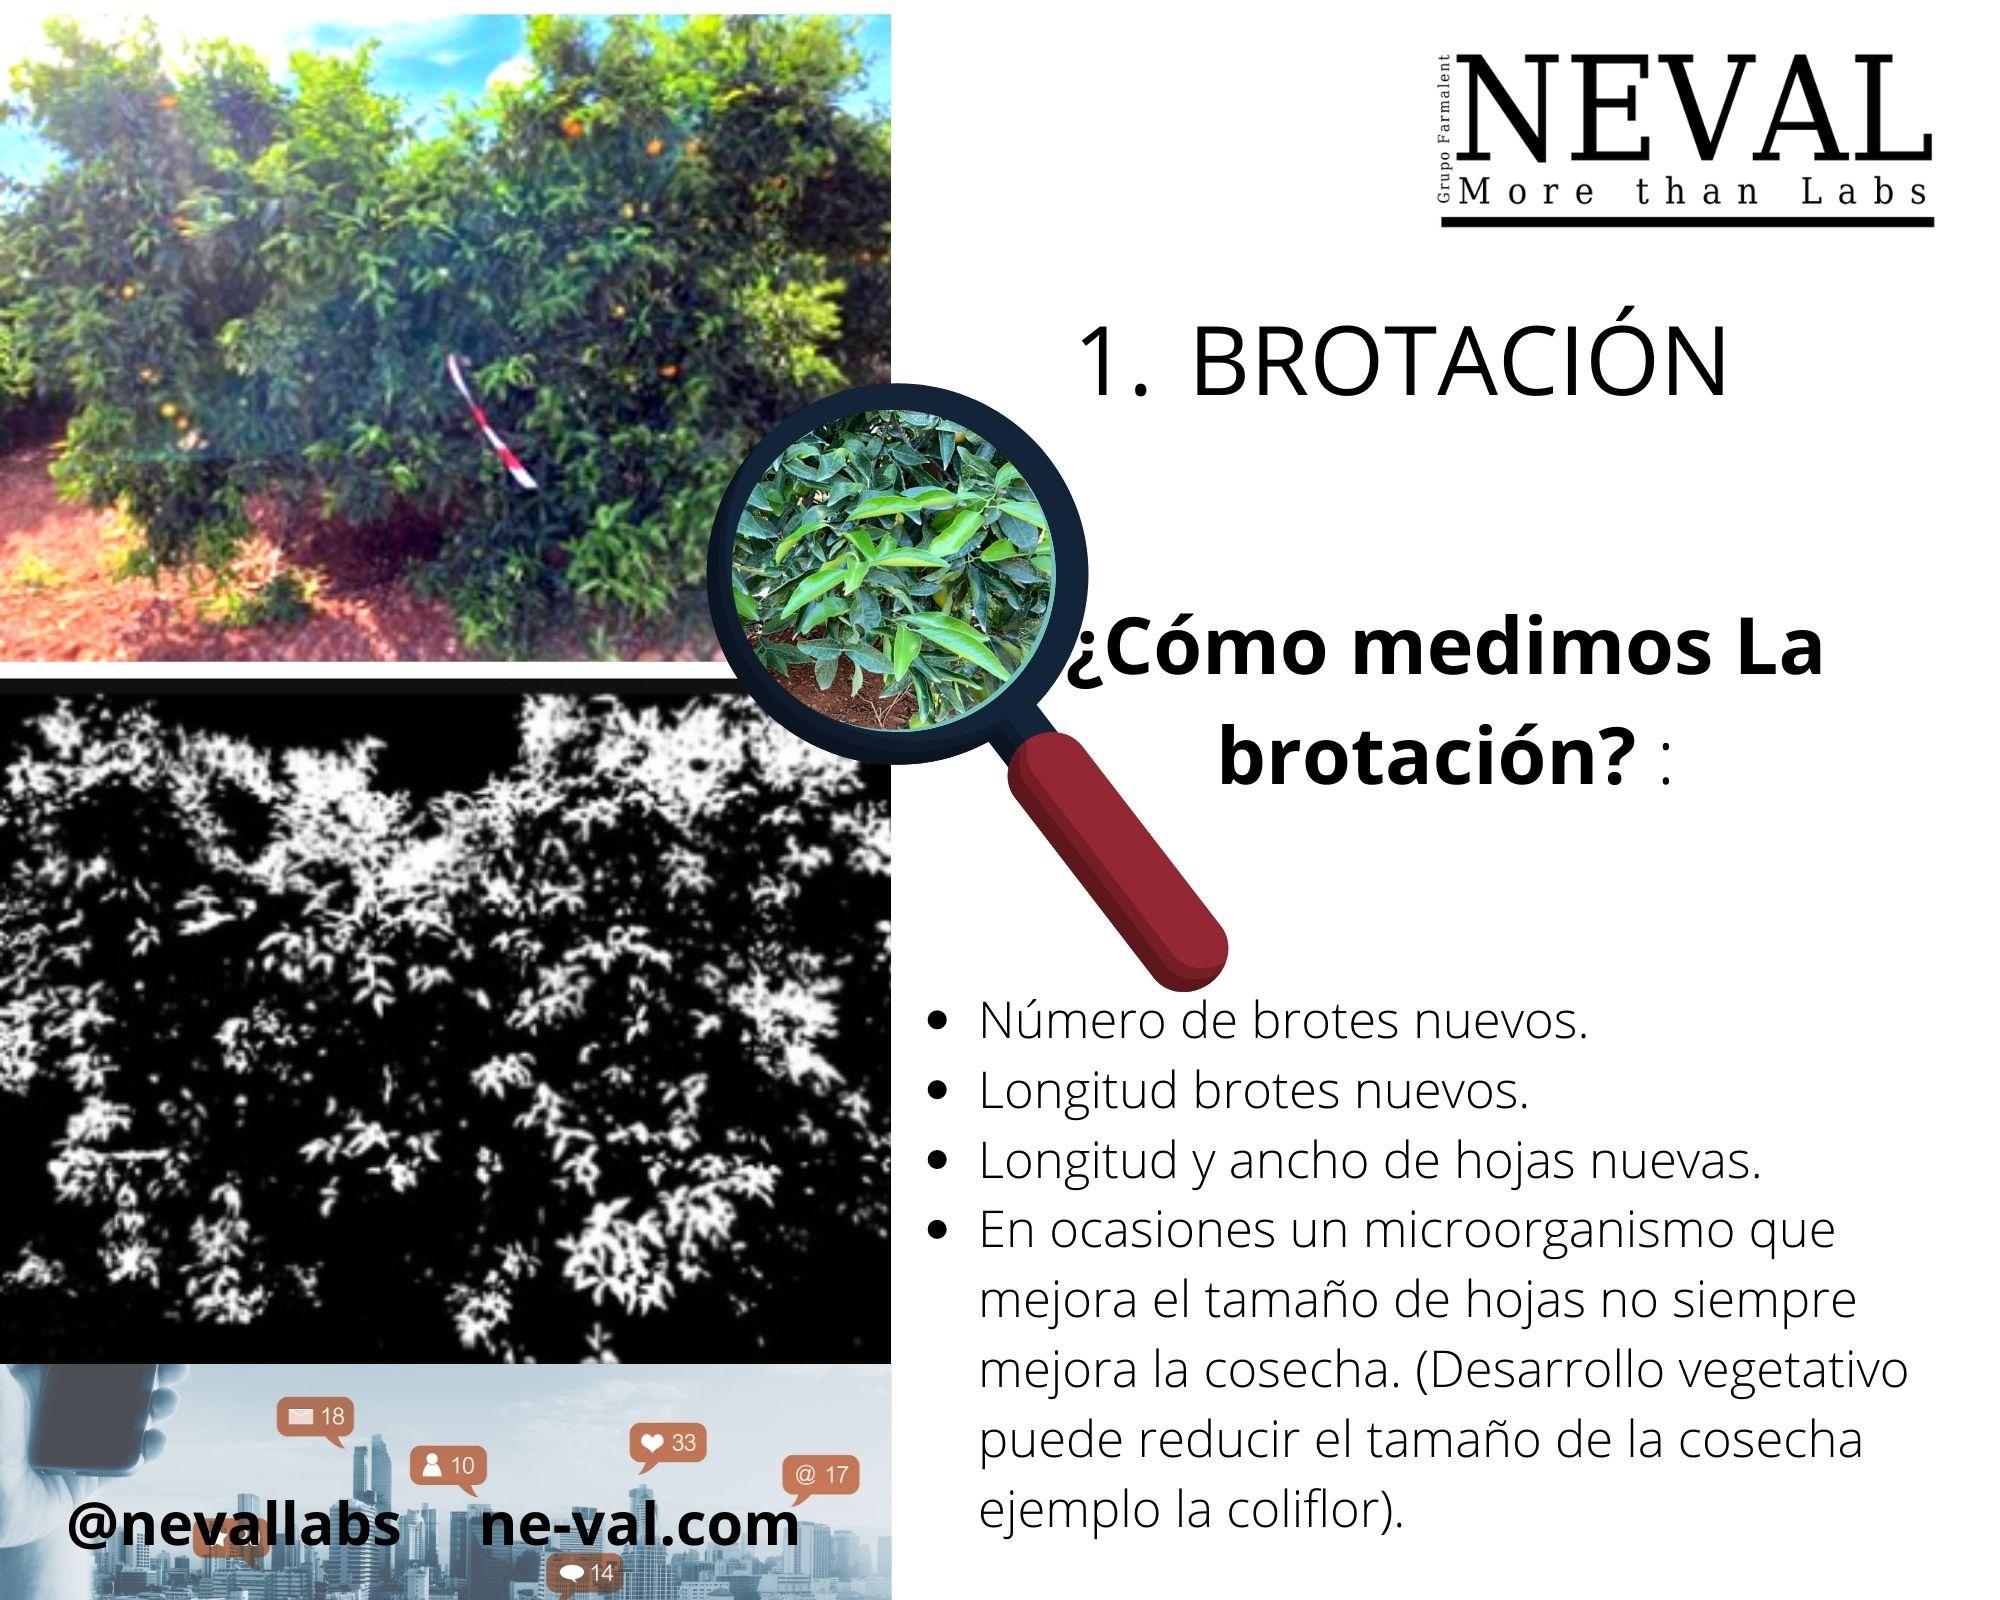 Empresa ensayos para registrar bioestimulantes españa